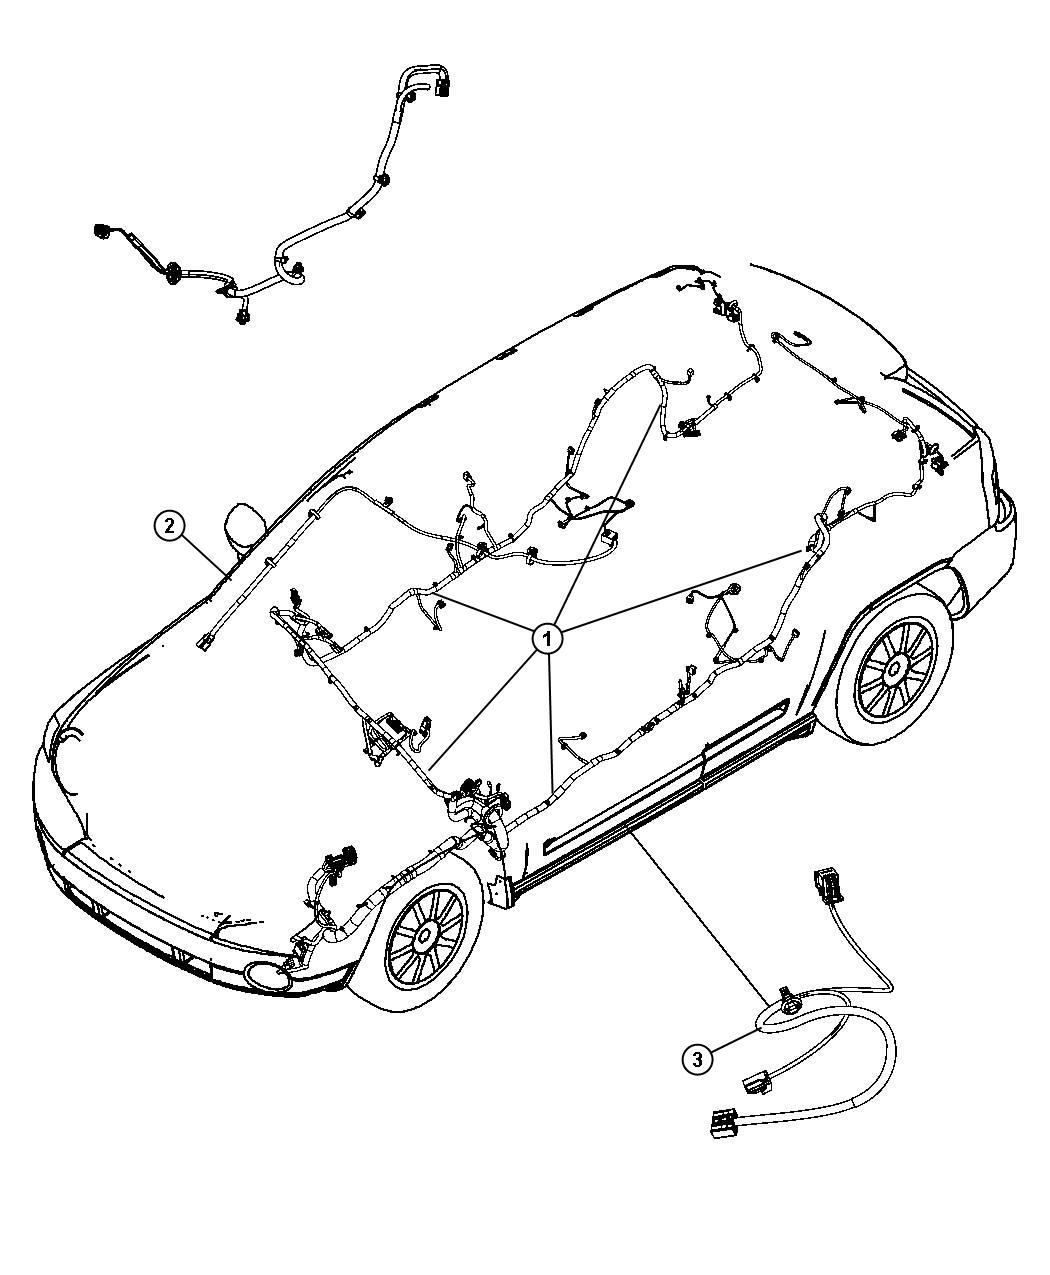 Dodge Caliber Wiring Unified Body Export European